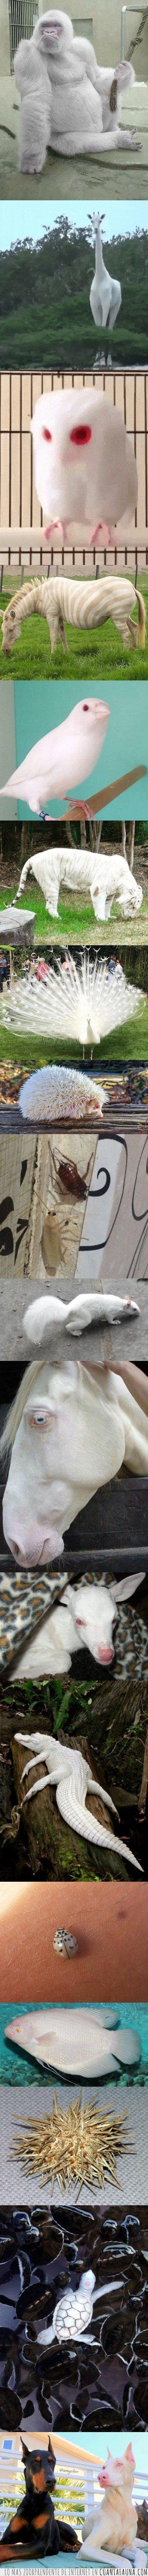 animales albinos,animales salvajes